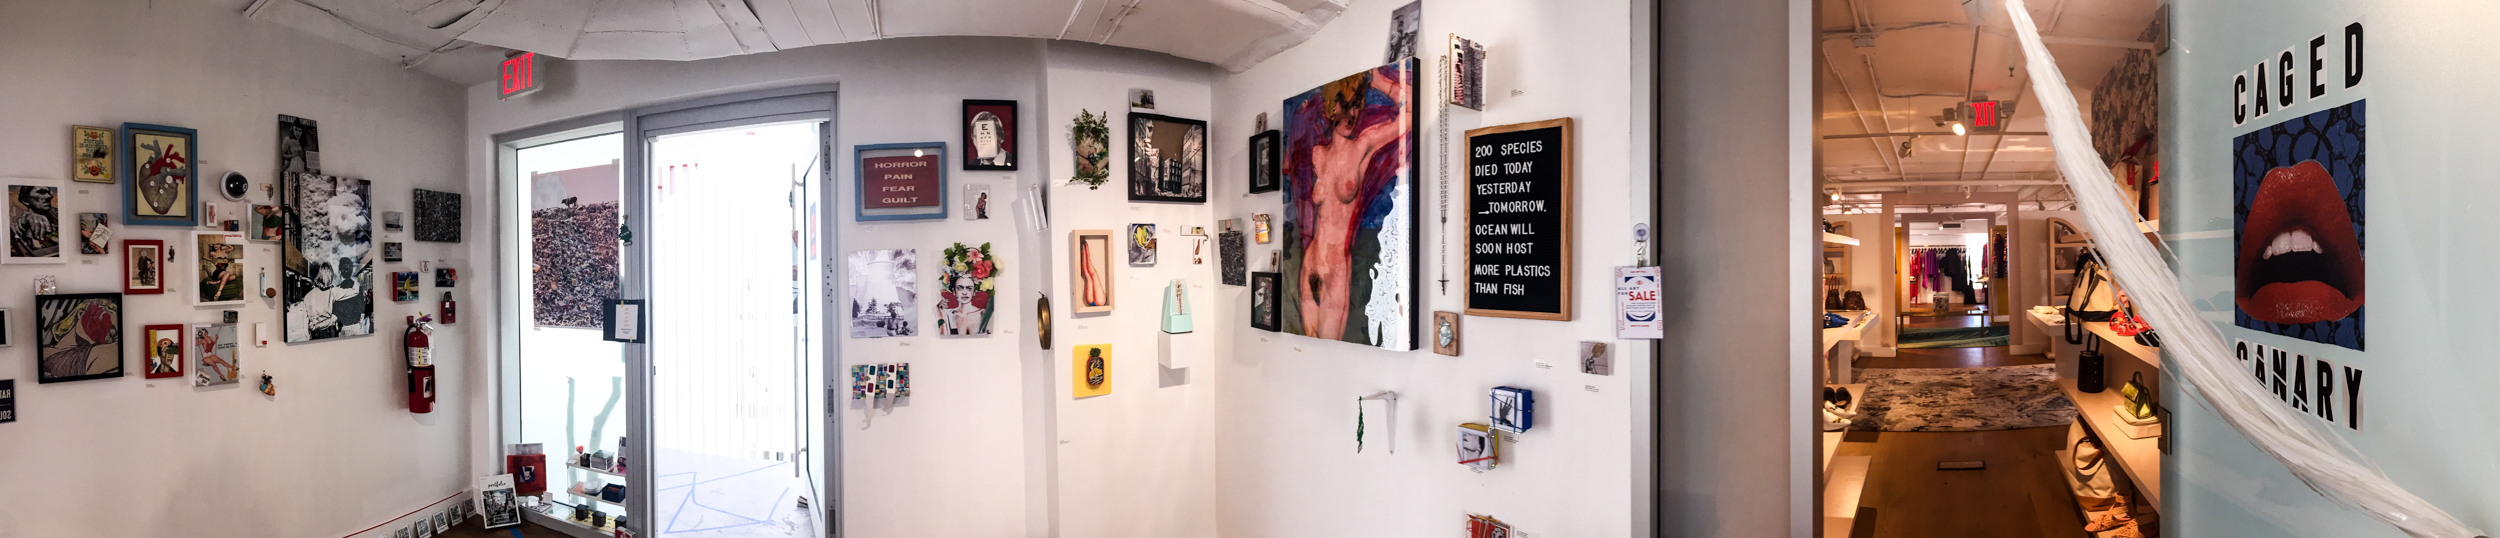 Faena-Exhibition-Images-139.jpg